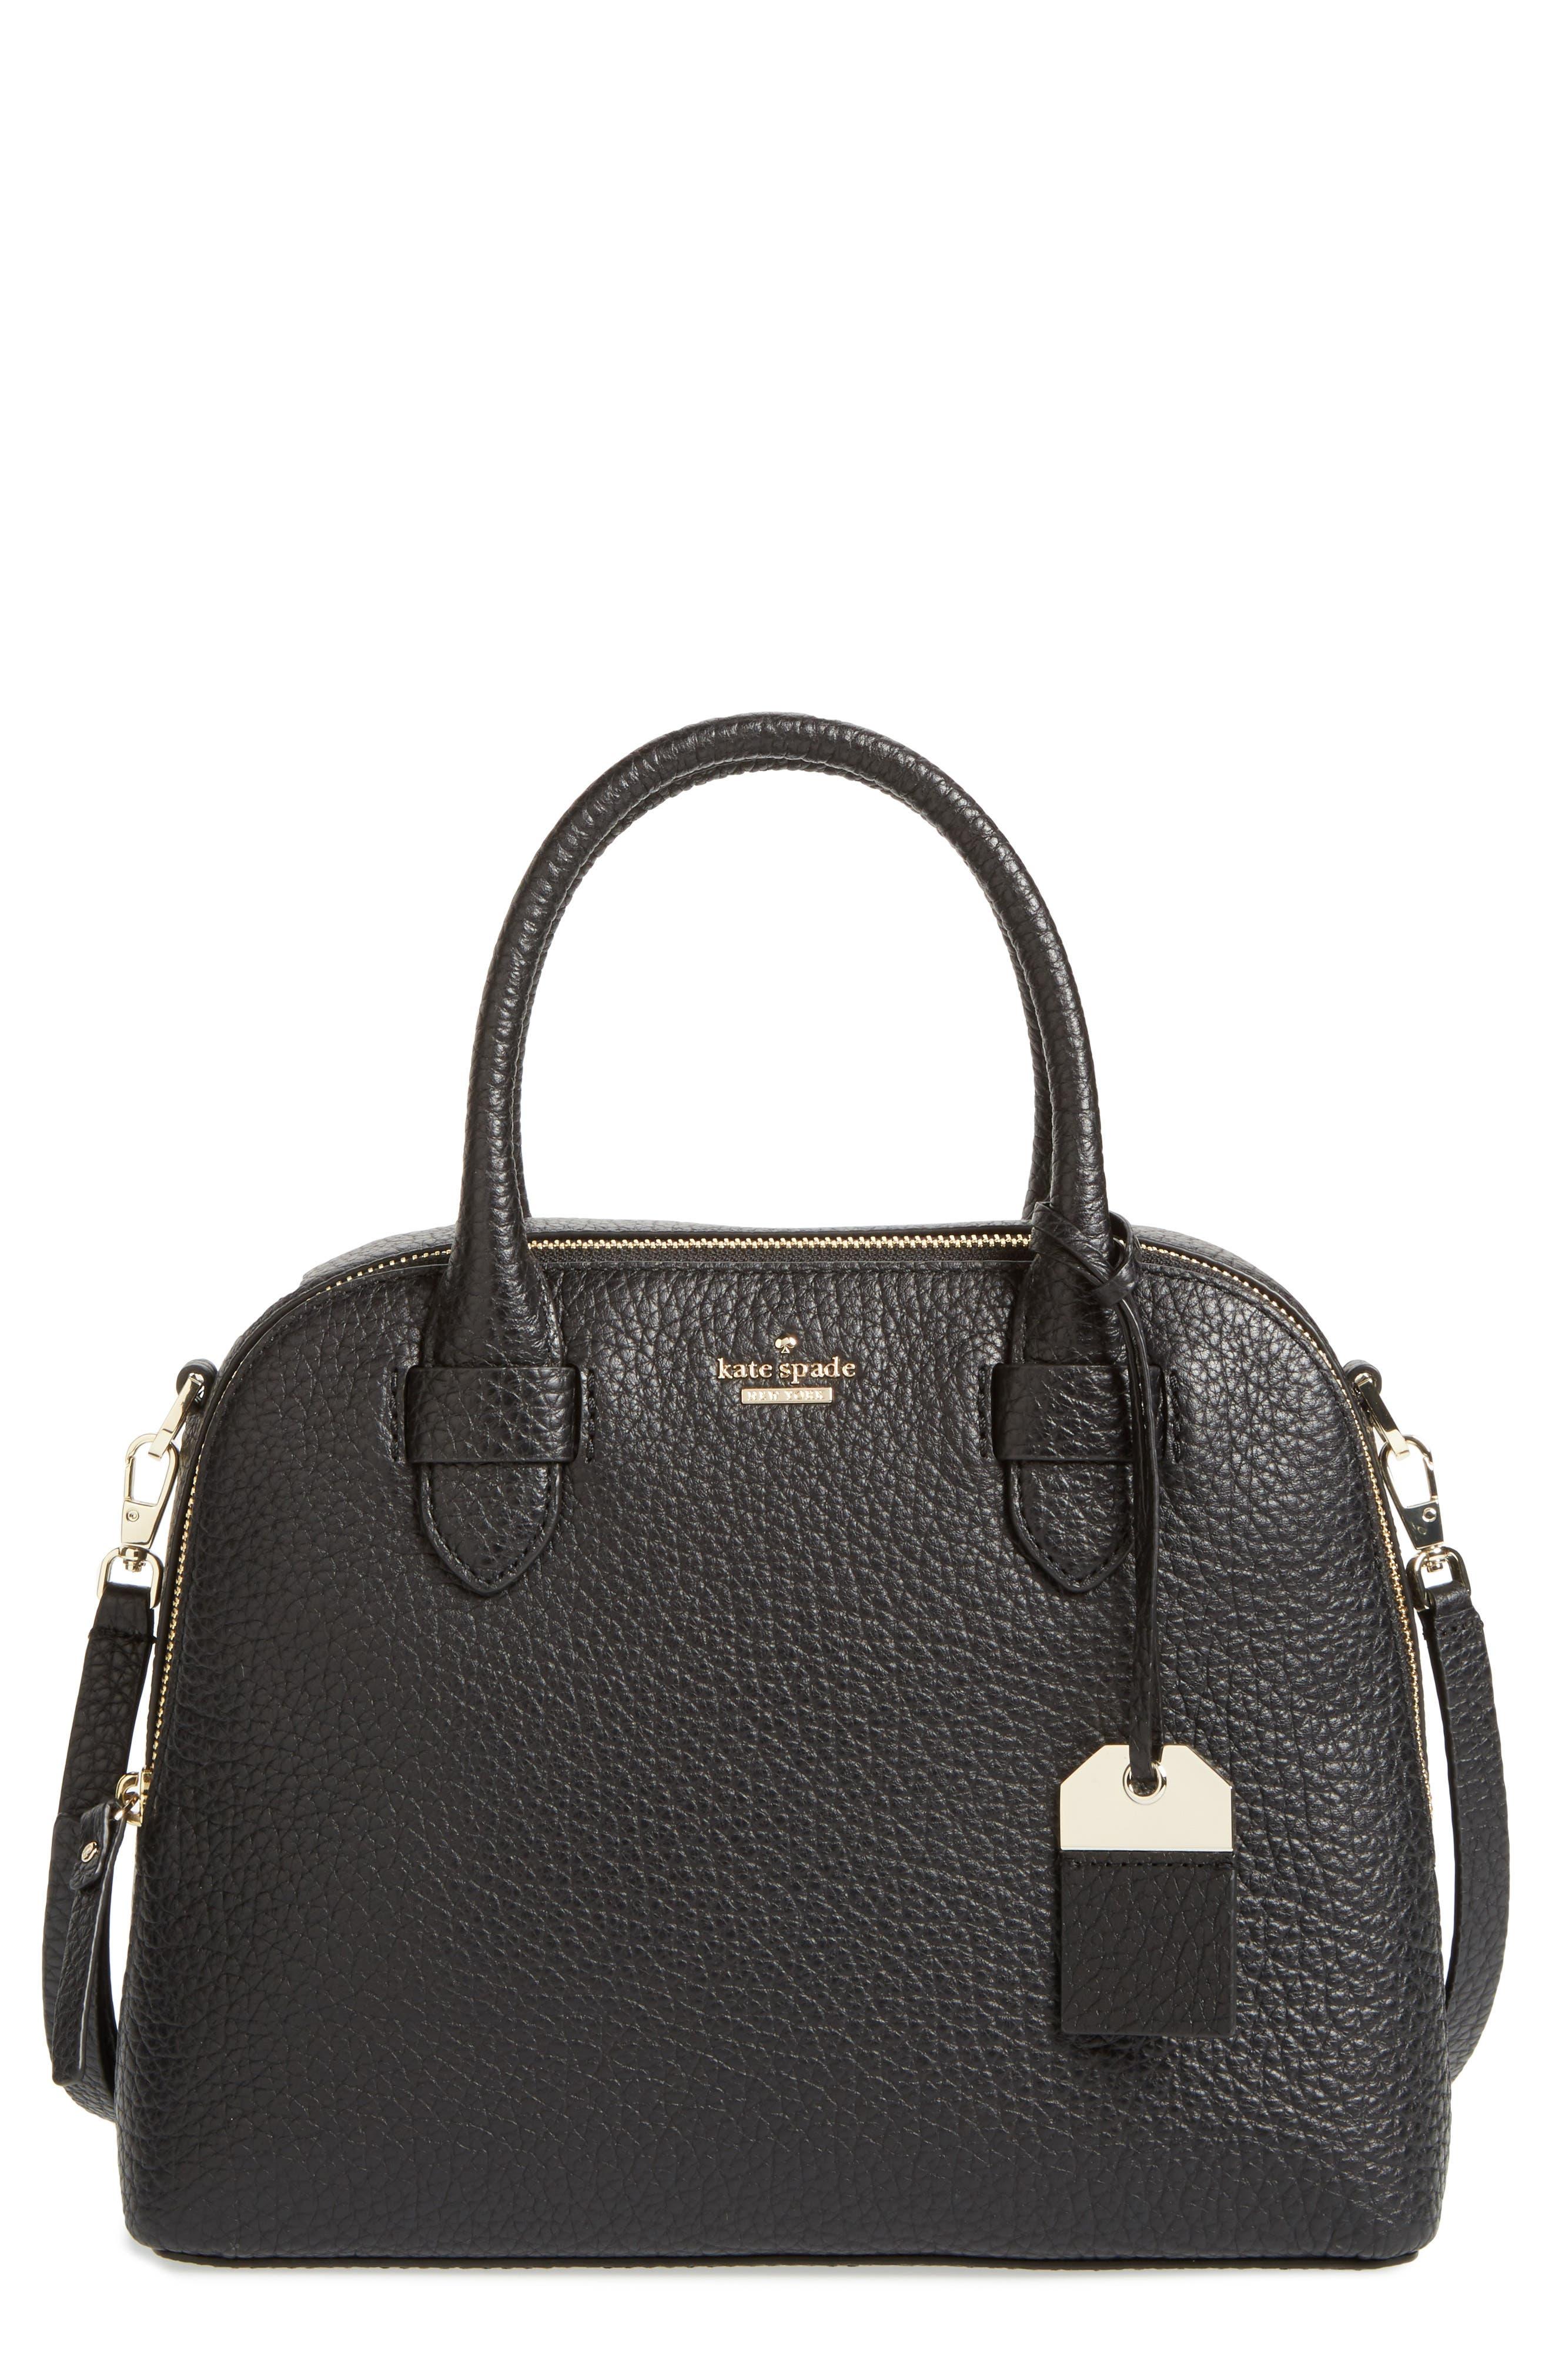 carter street - small ashleigh leather satchel,                             Main thumbnail 1, color,                             001